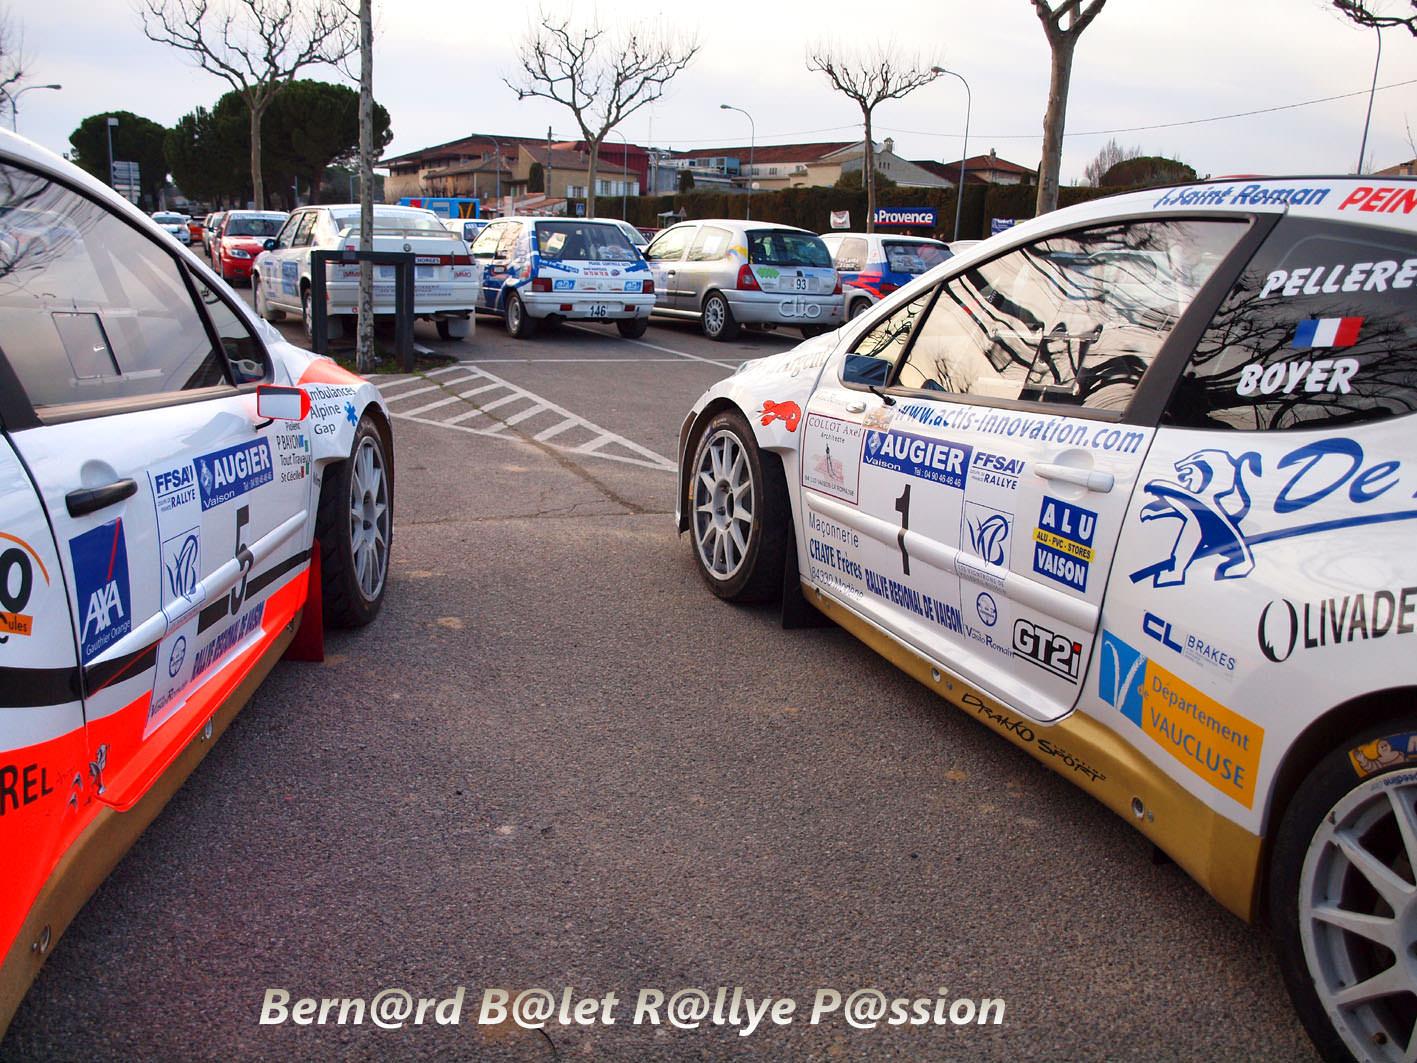 Alu Design Vaison La Romaine rallye de vaison la romaine 2014 - team vasio romain